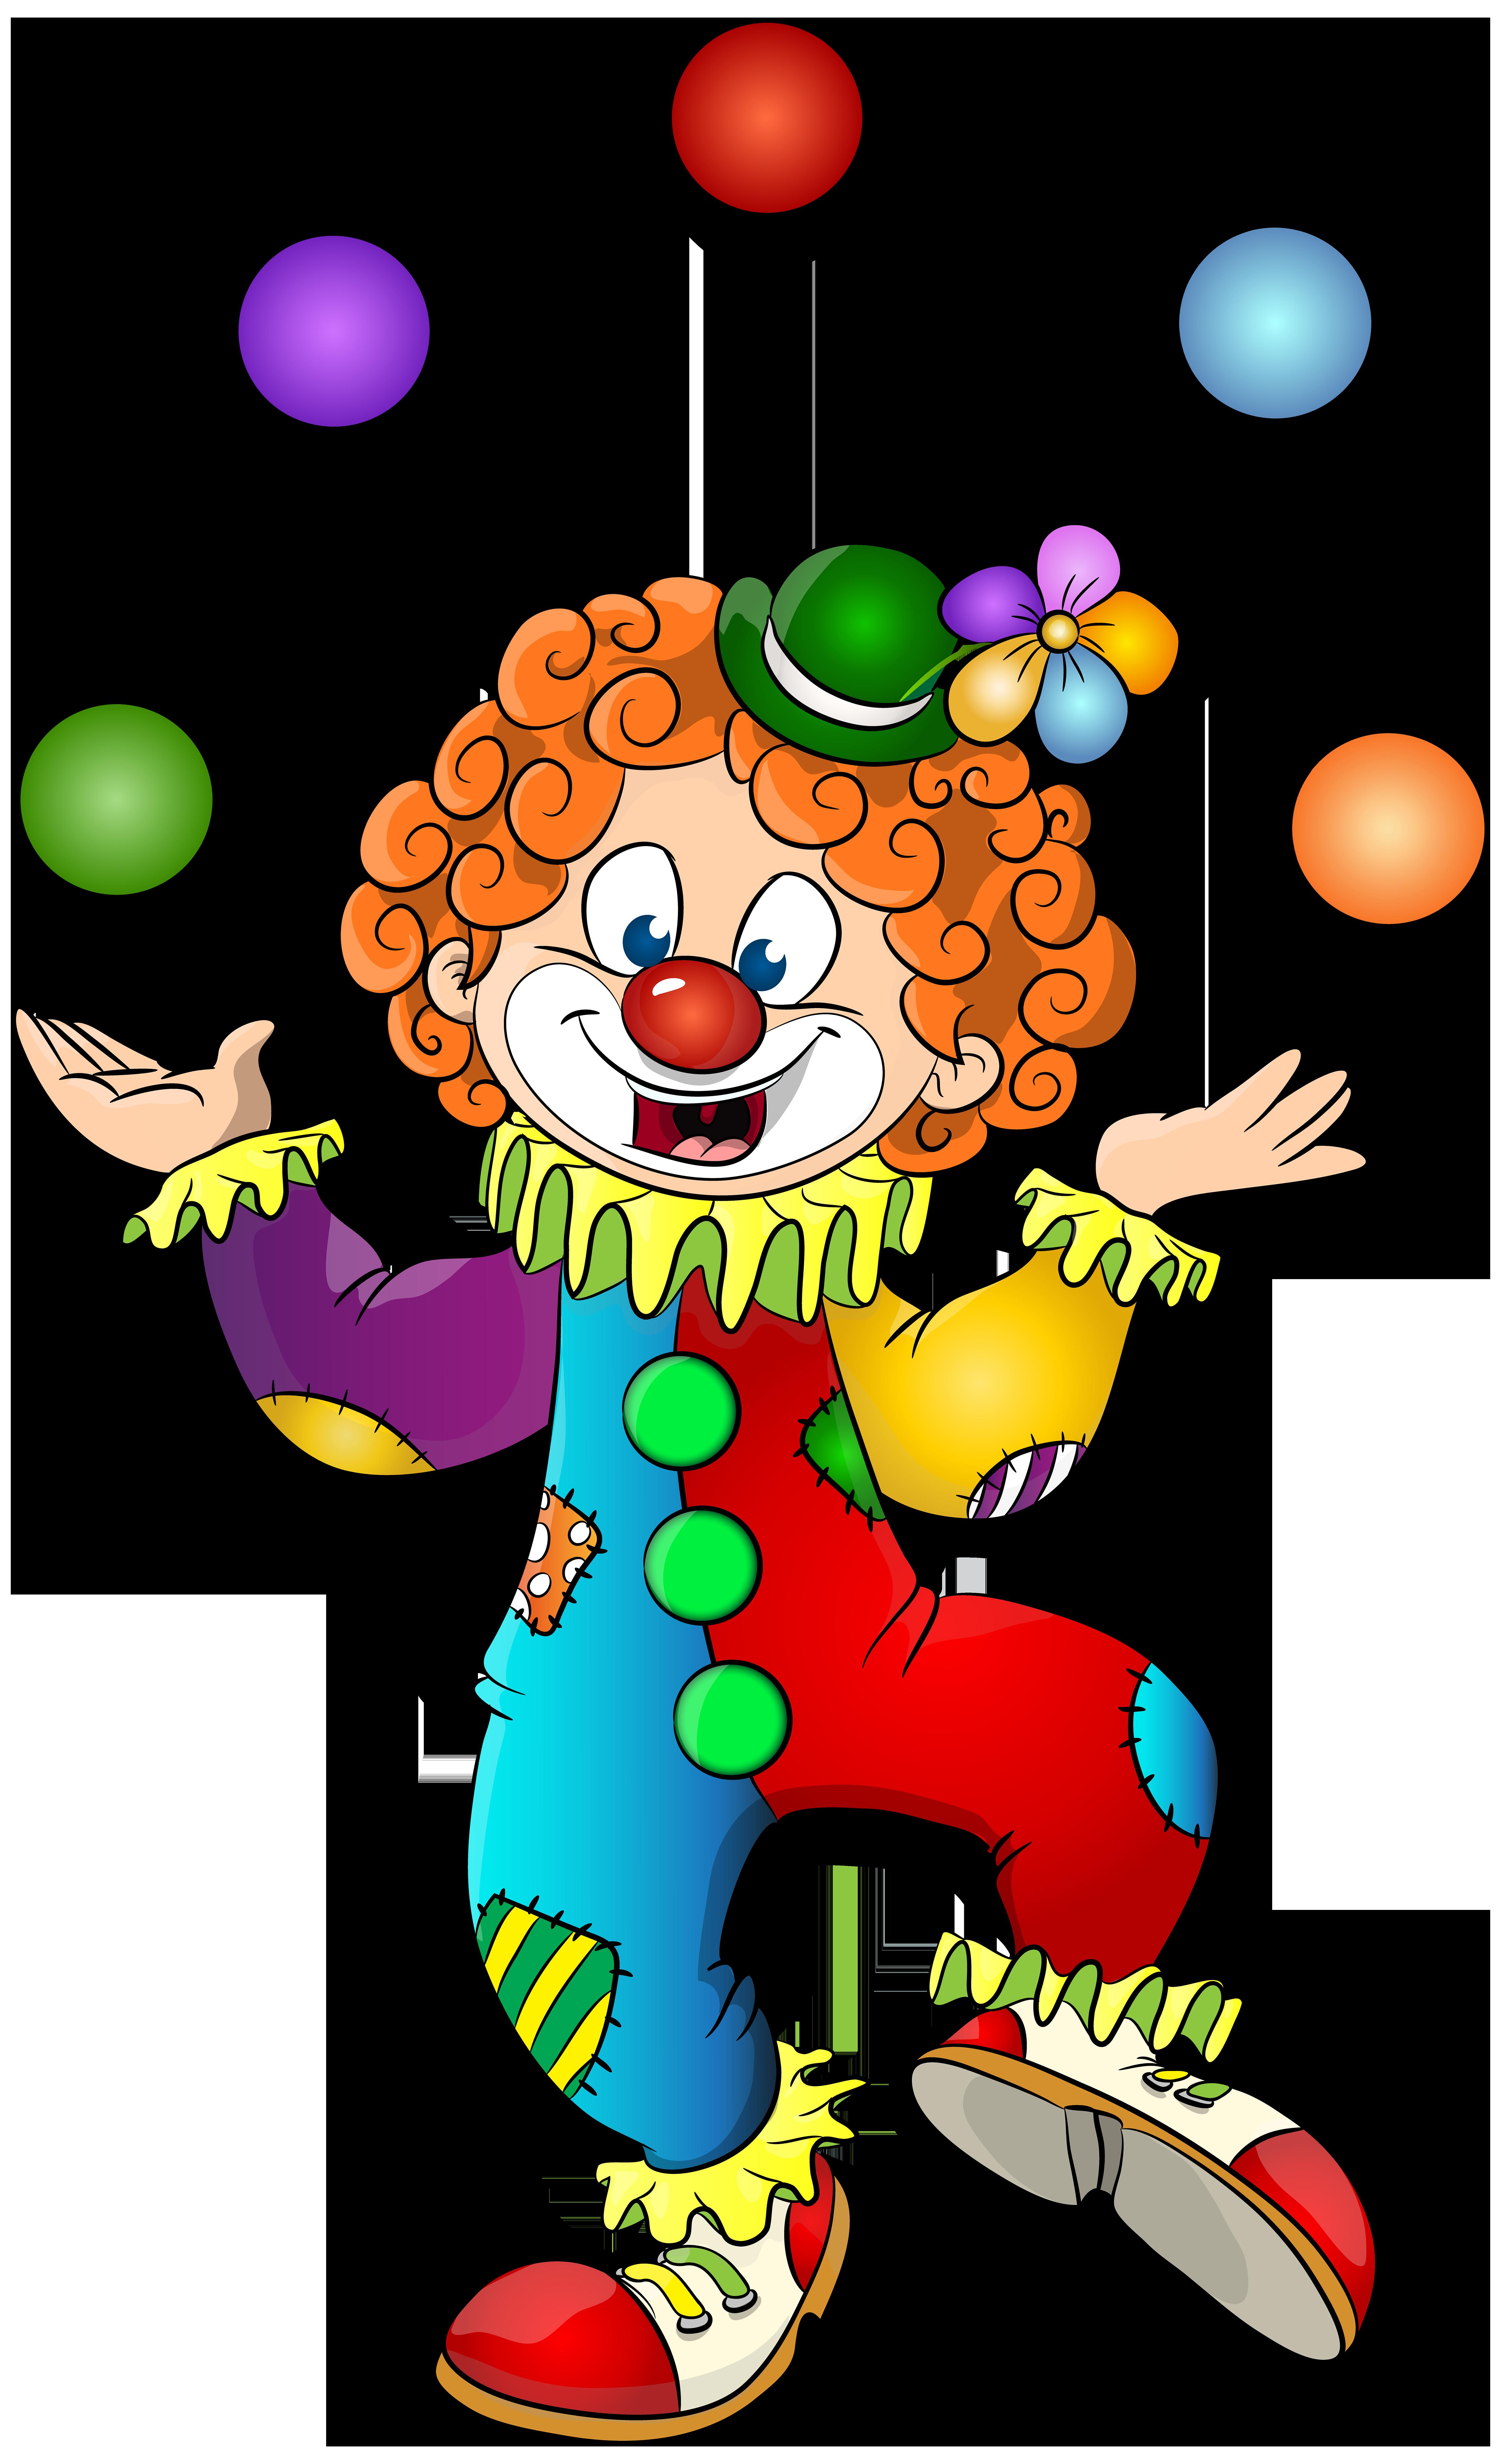 Clipart balloon clown. Transparent clip art image